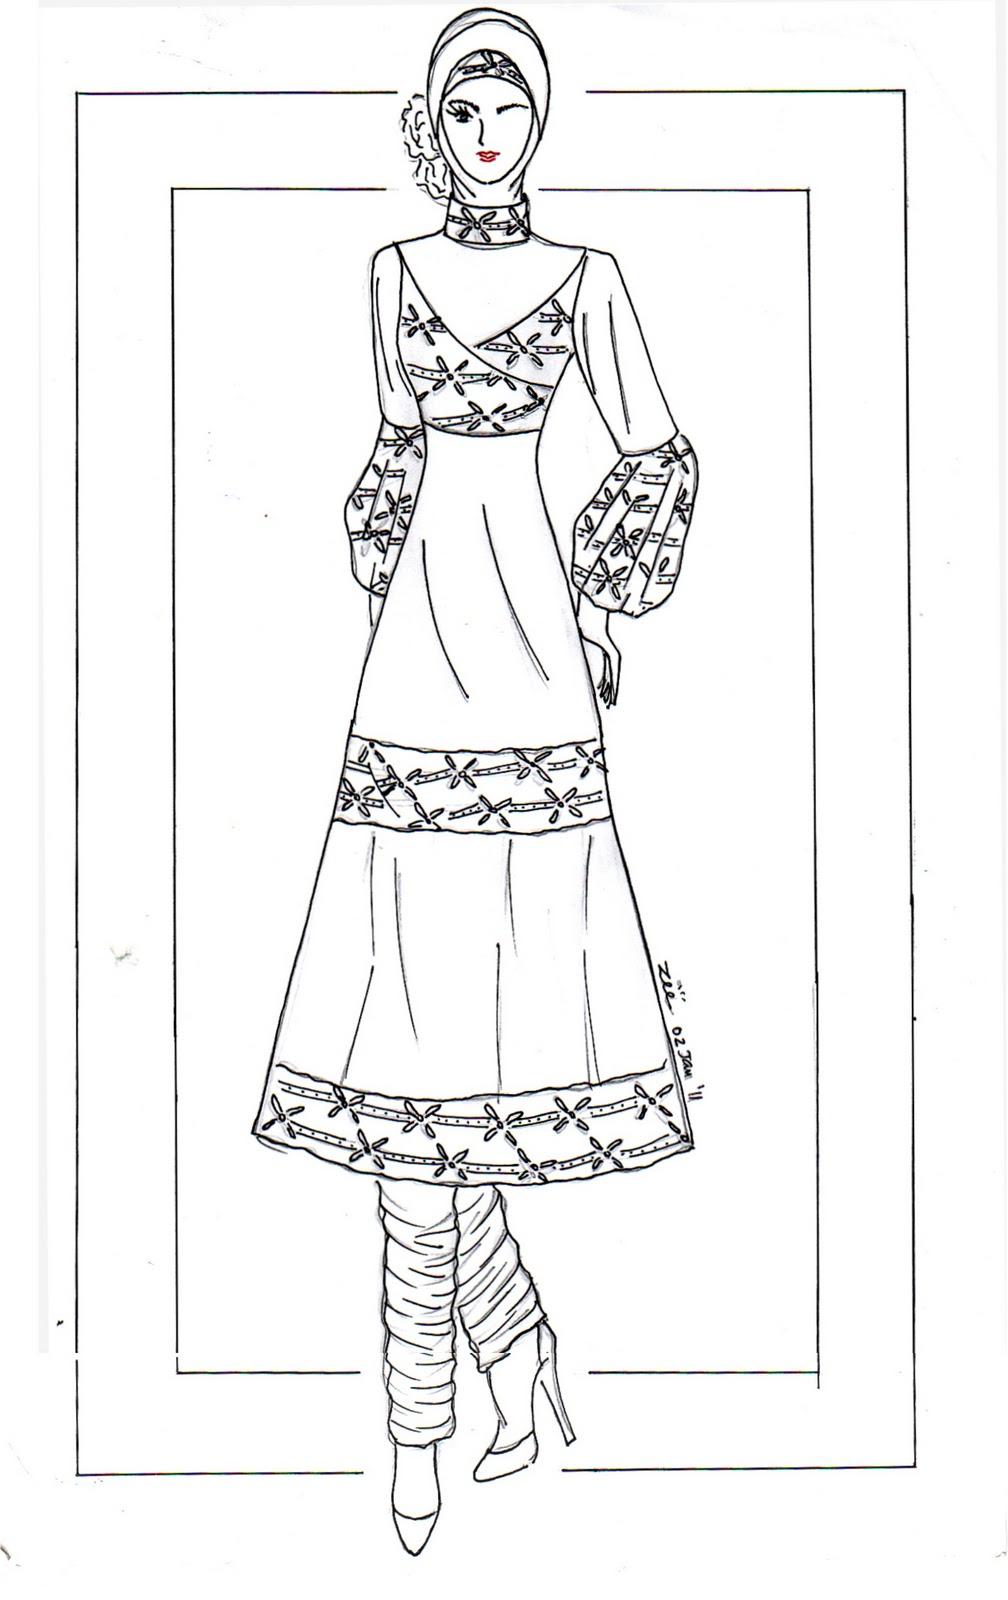 Kumpulan Soal Pelajaran 8 Gambar Sketsa Desain Baju Muslim